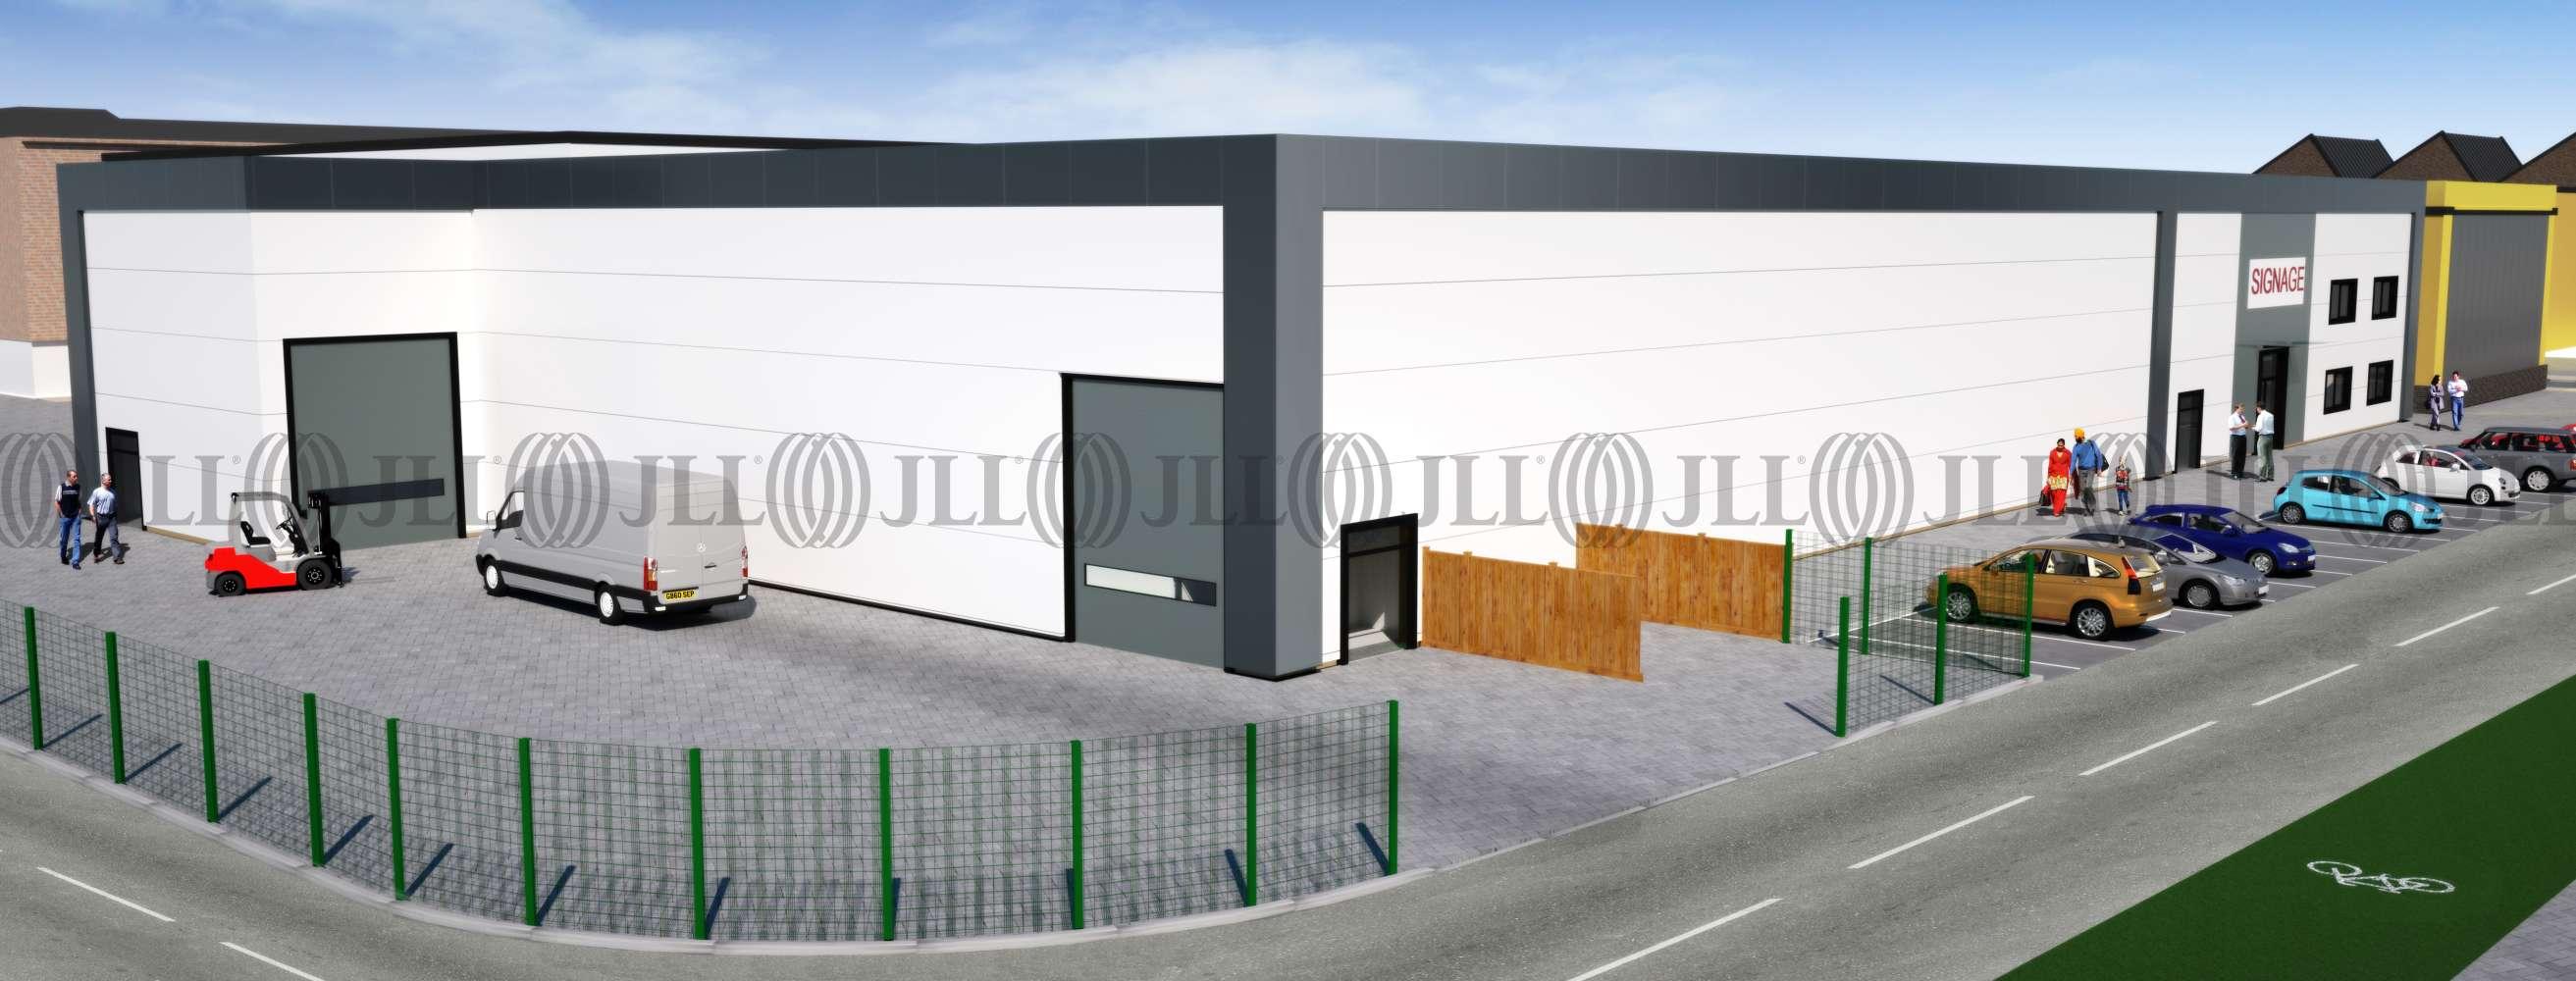 Industrial Leicester, LE4 6AR - Golden Gate Park - 1